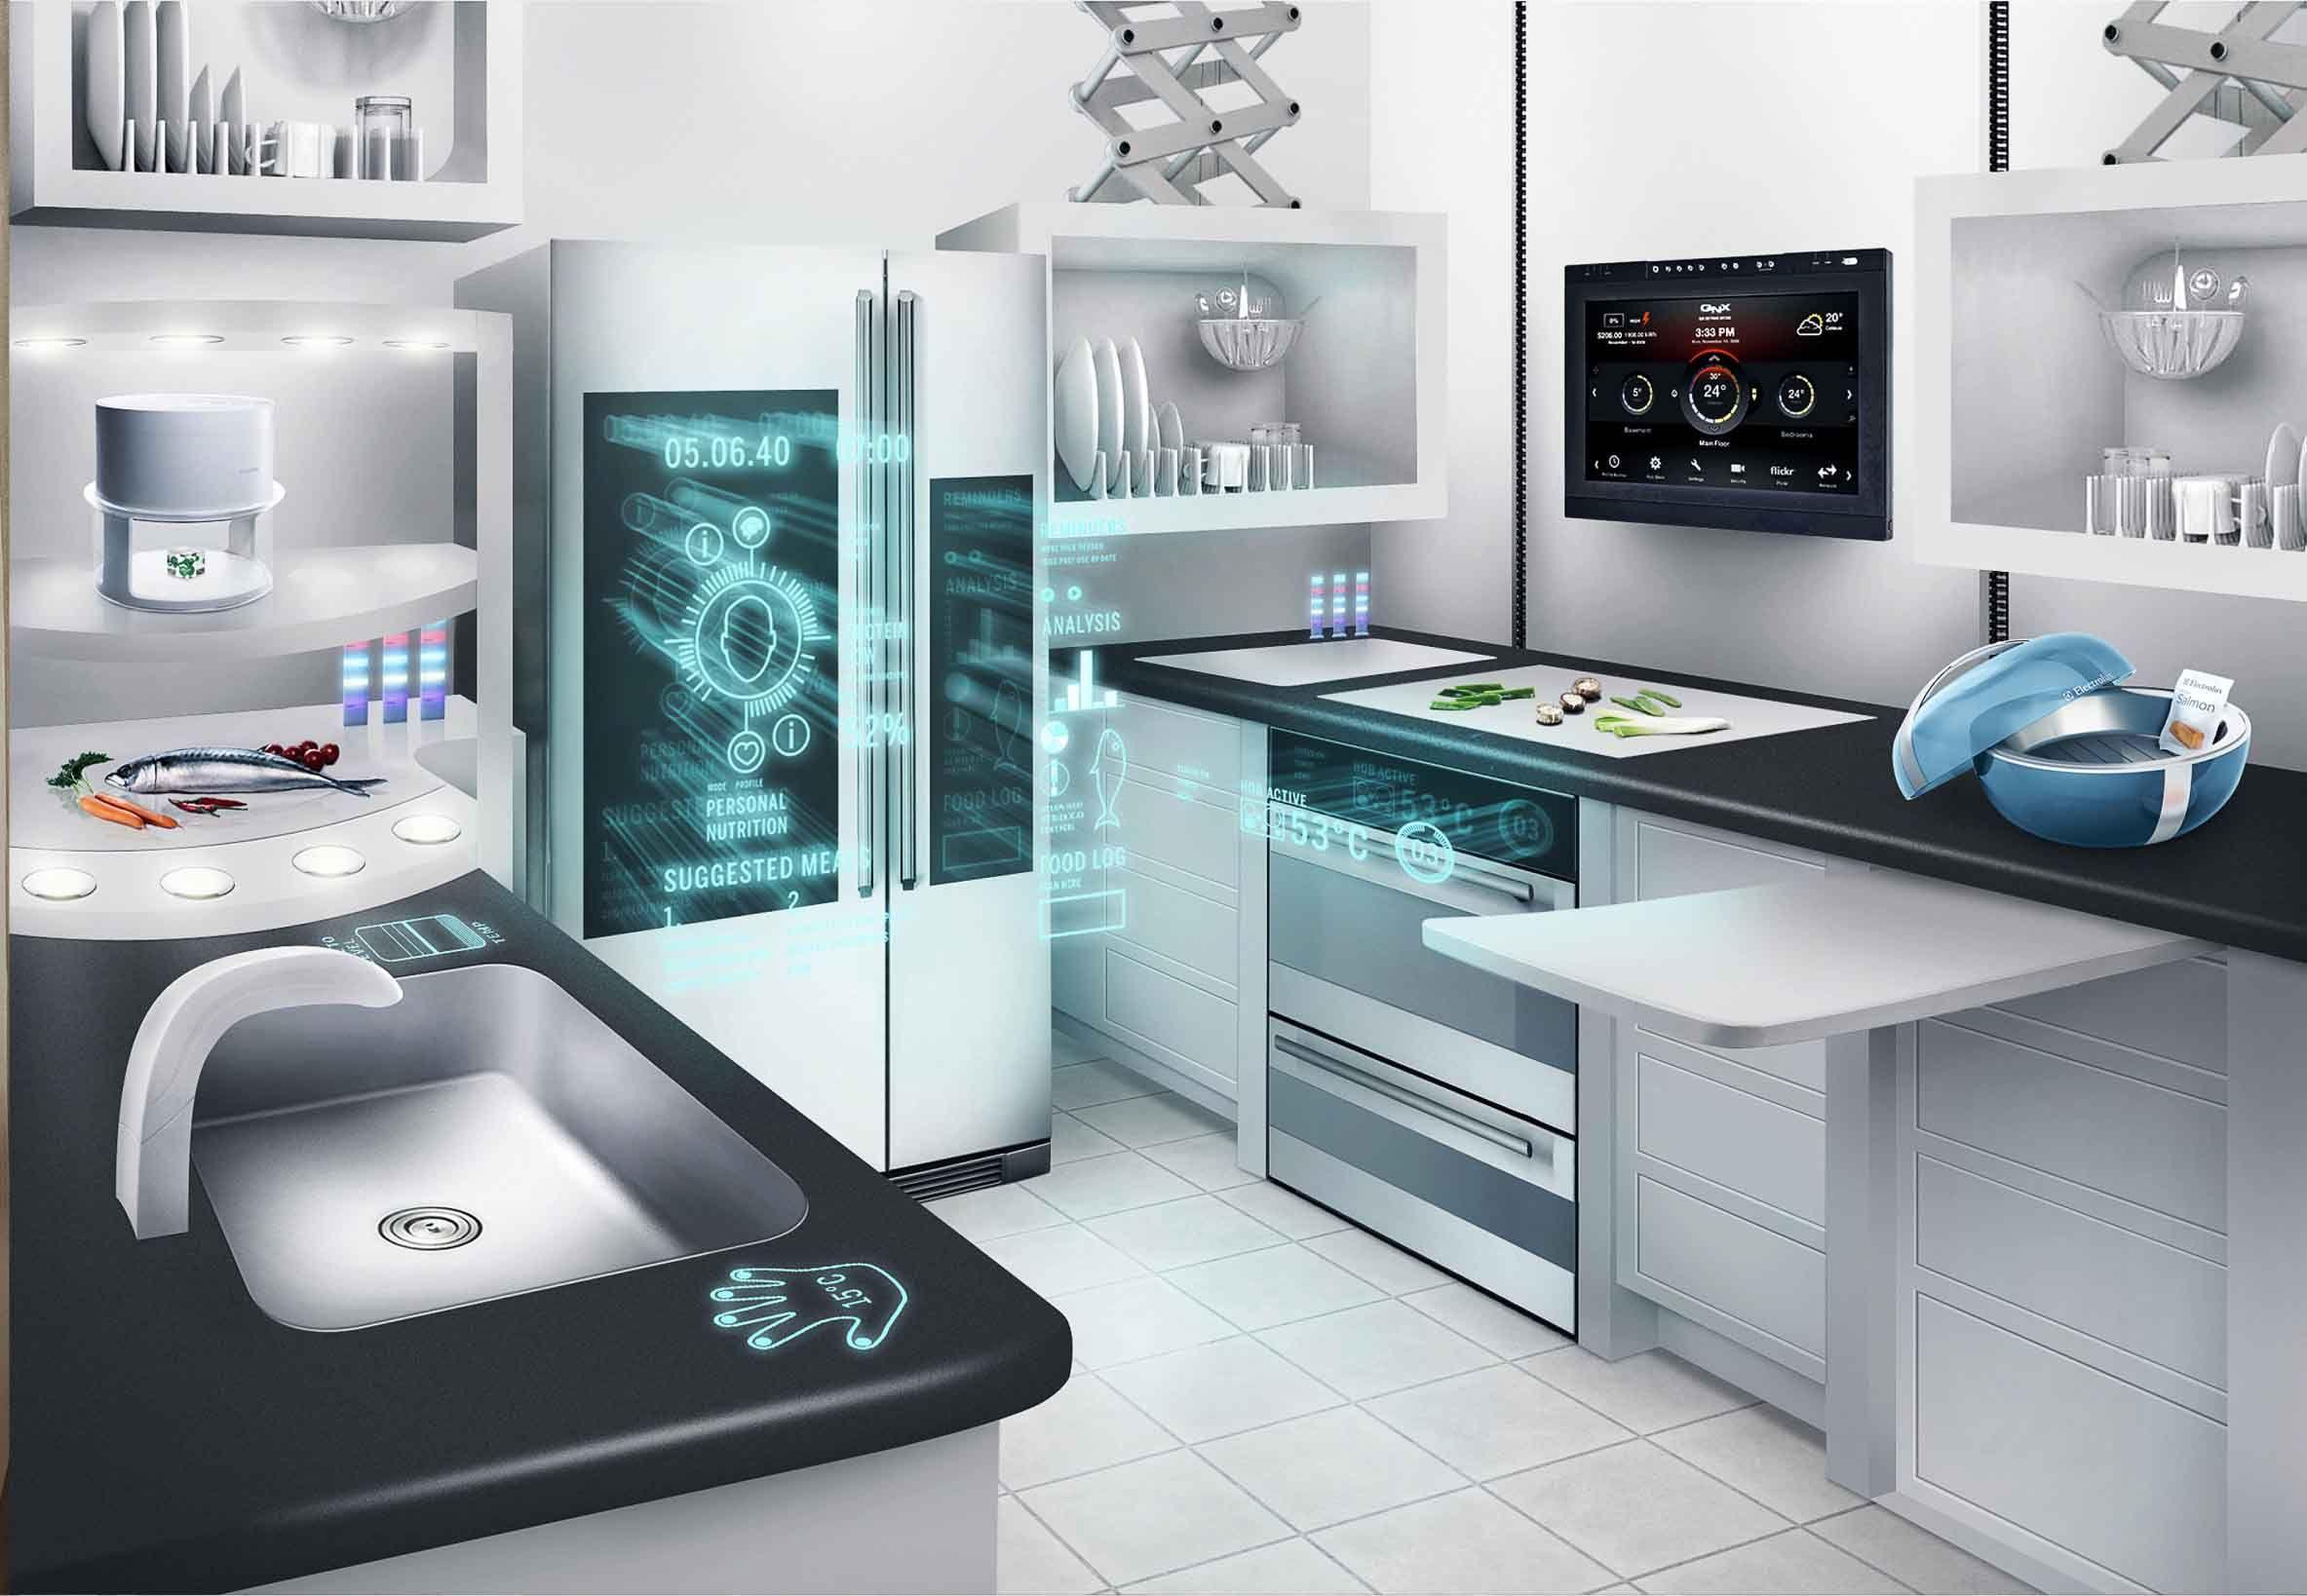 future kitchens